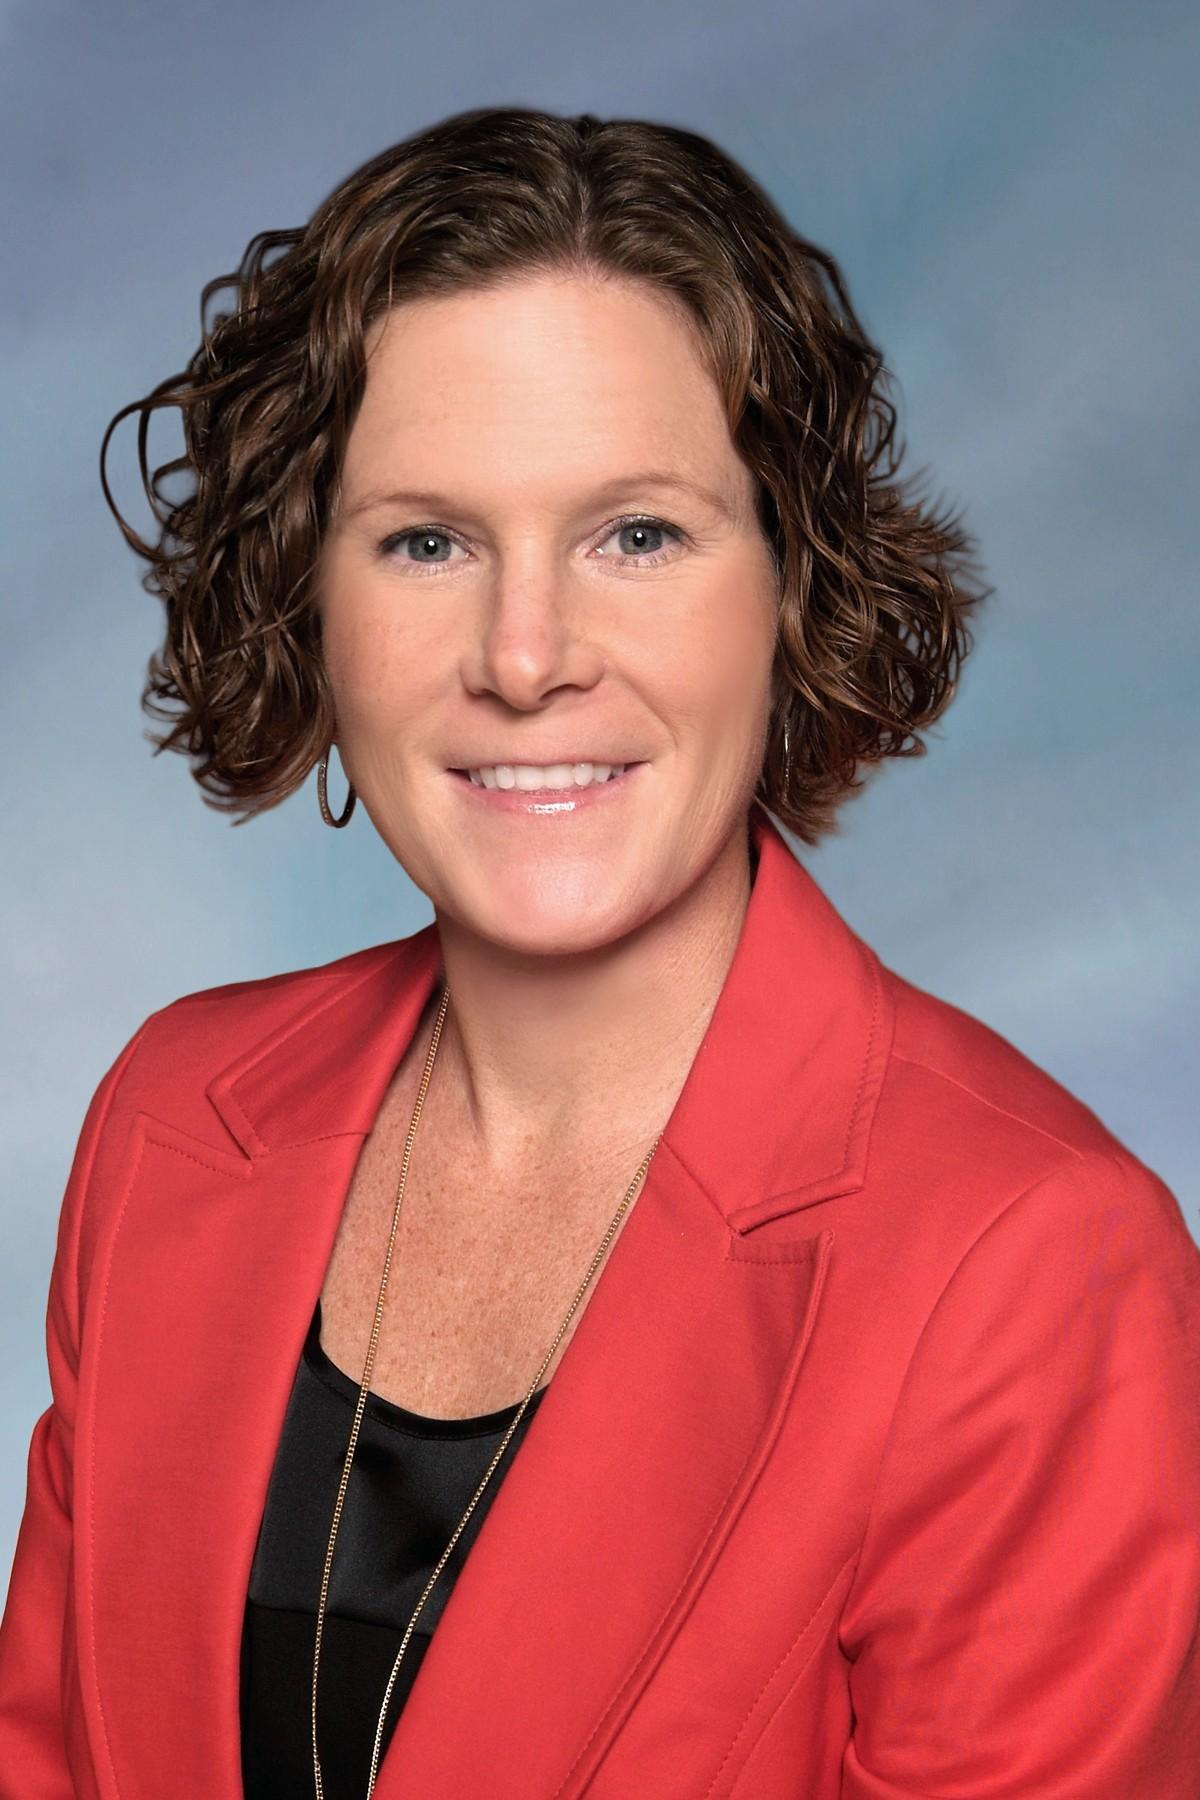 Jeri Lynn Coker